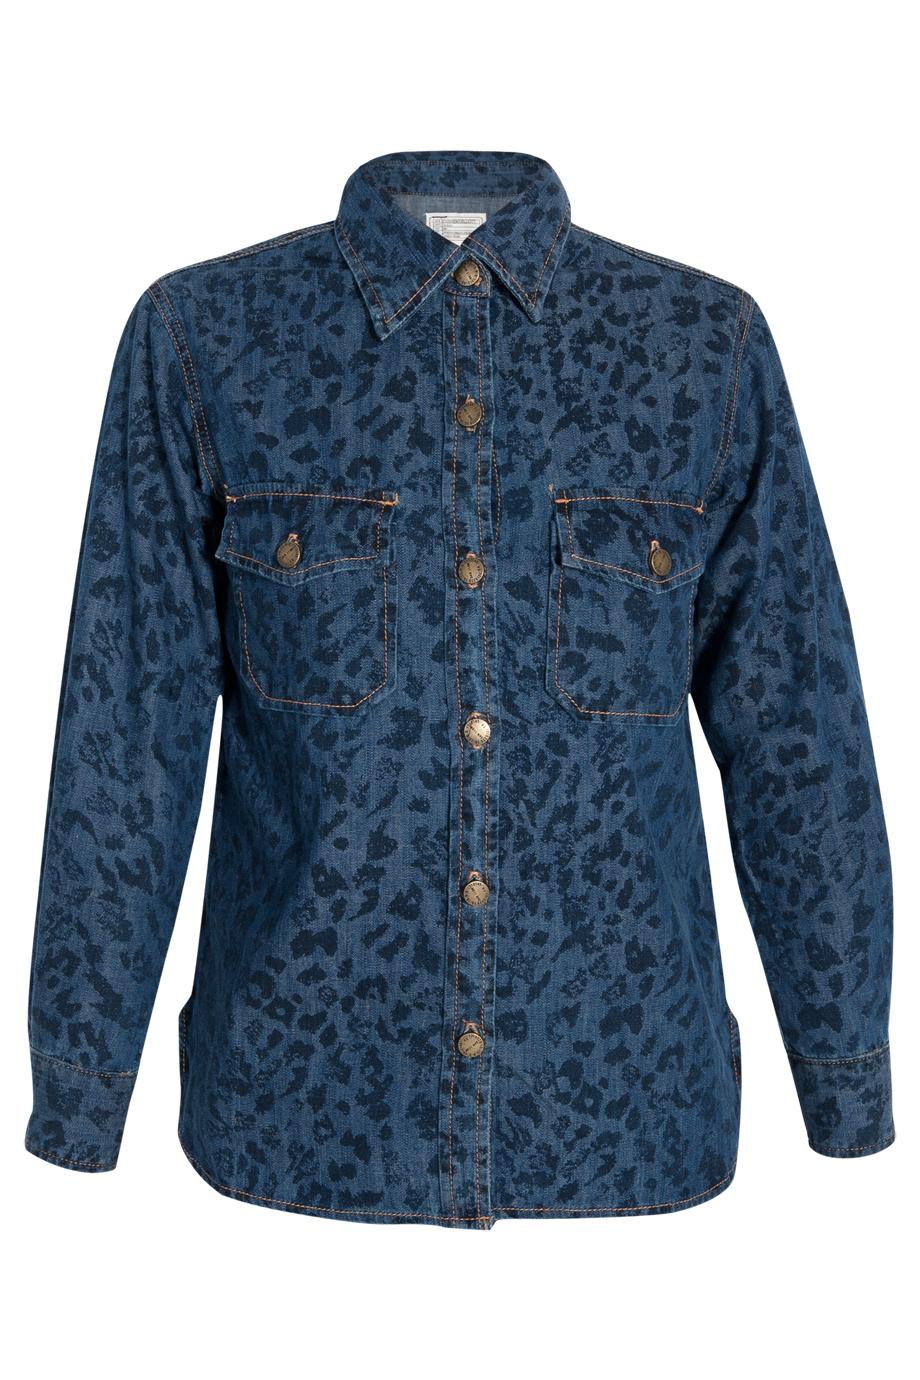 Blue Leopard Print Denim Panel Shirt